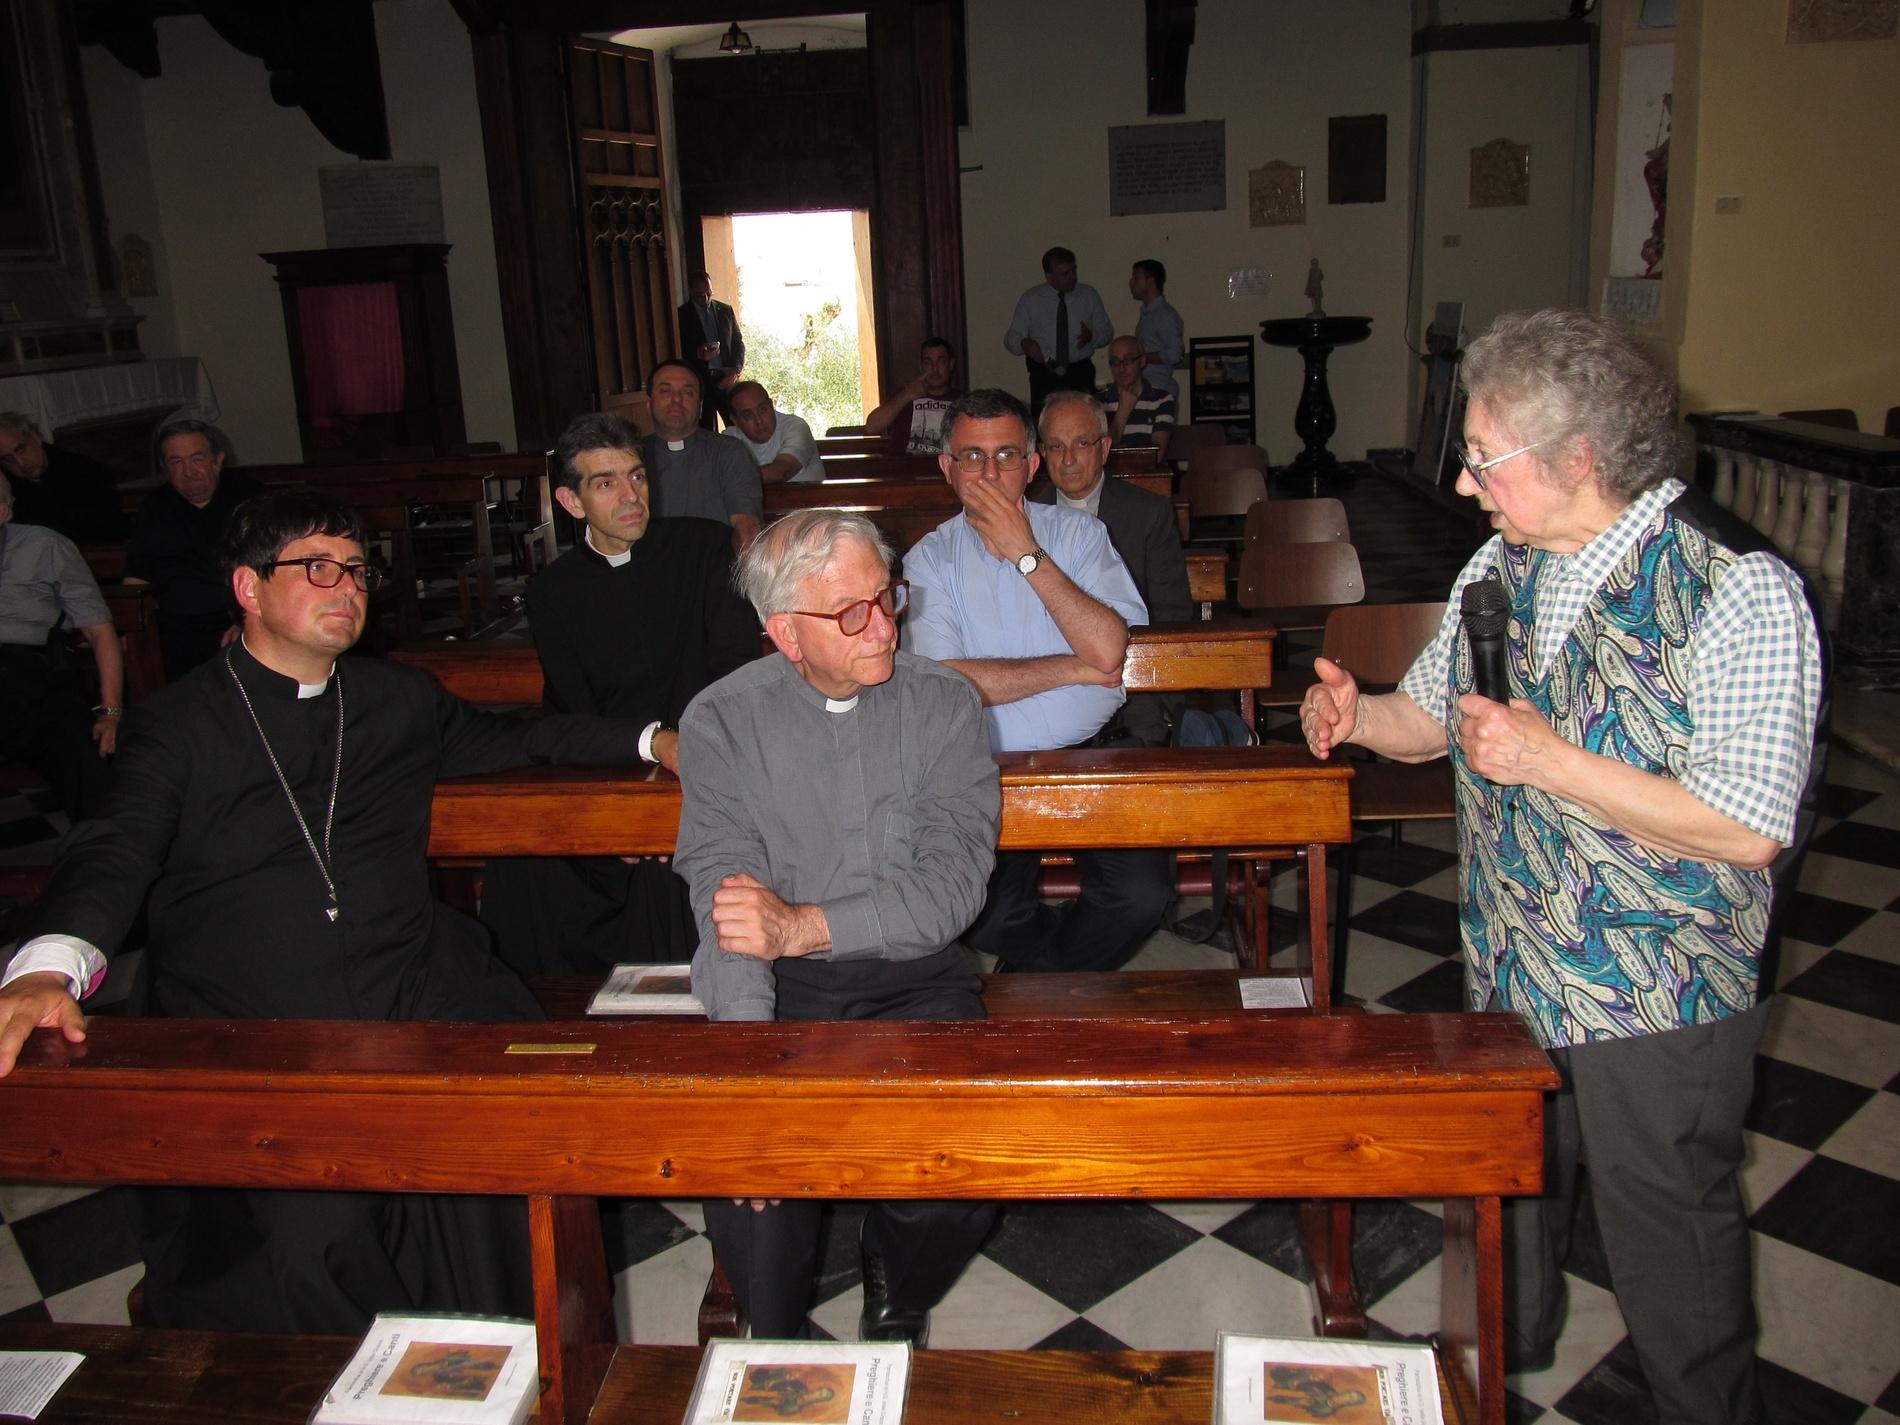 gita-clero-portovenere-lunigiana-2015-06-08-15-15-54